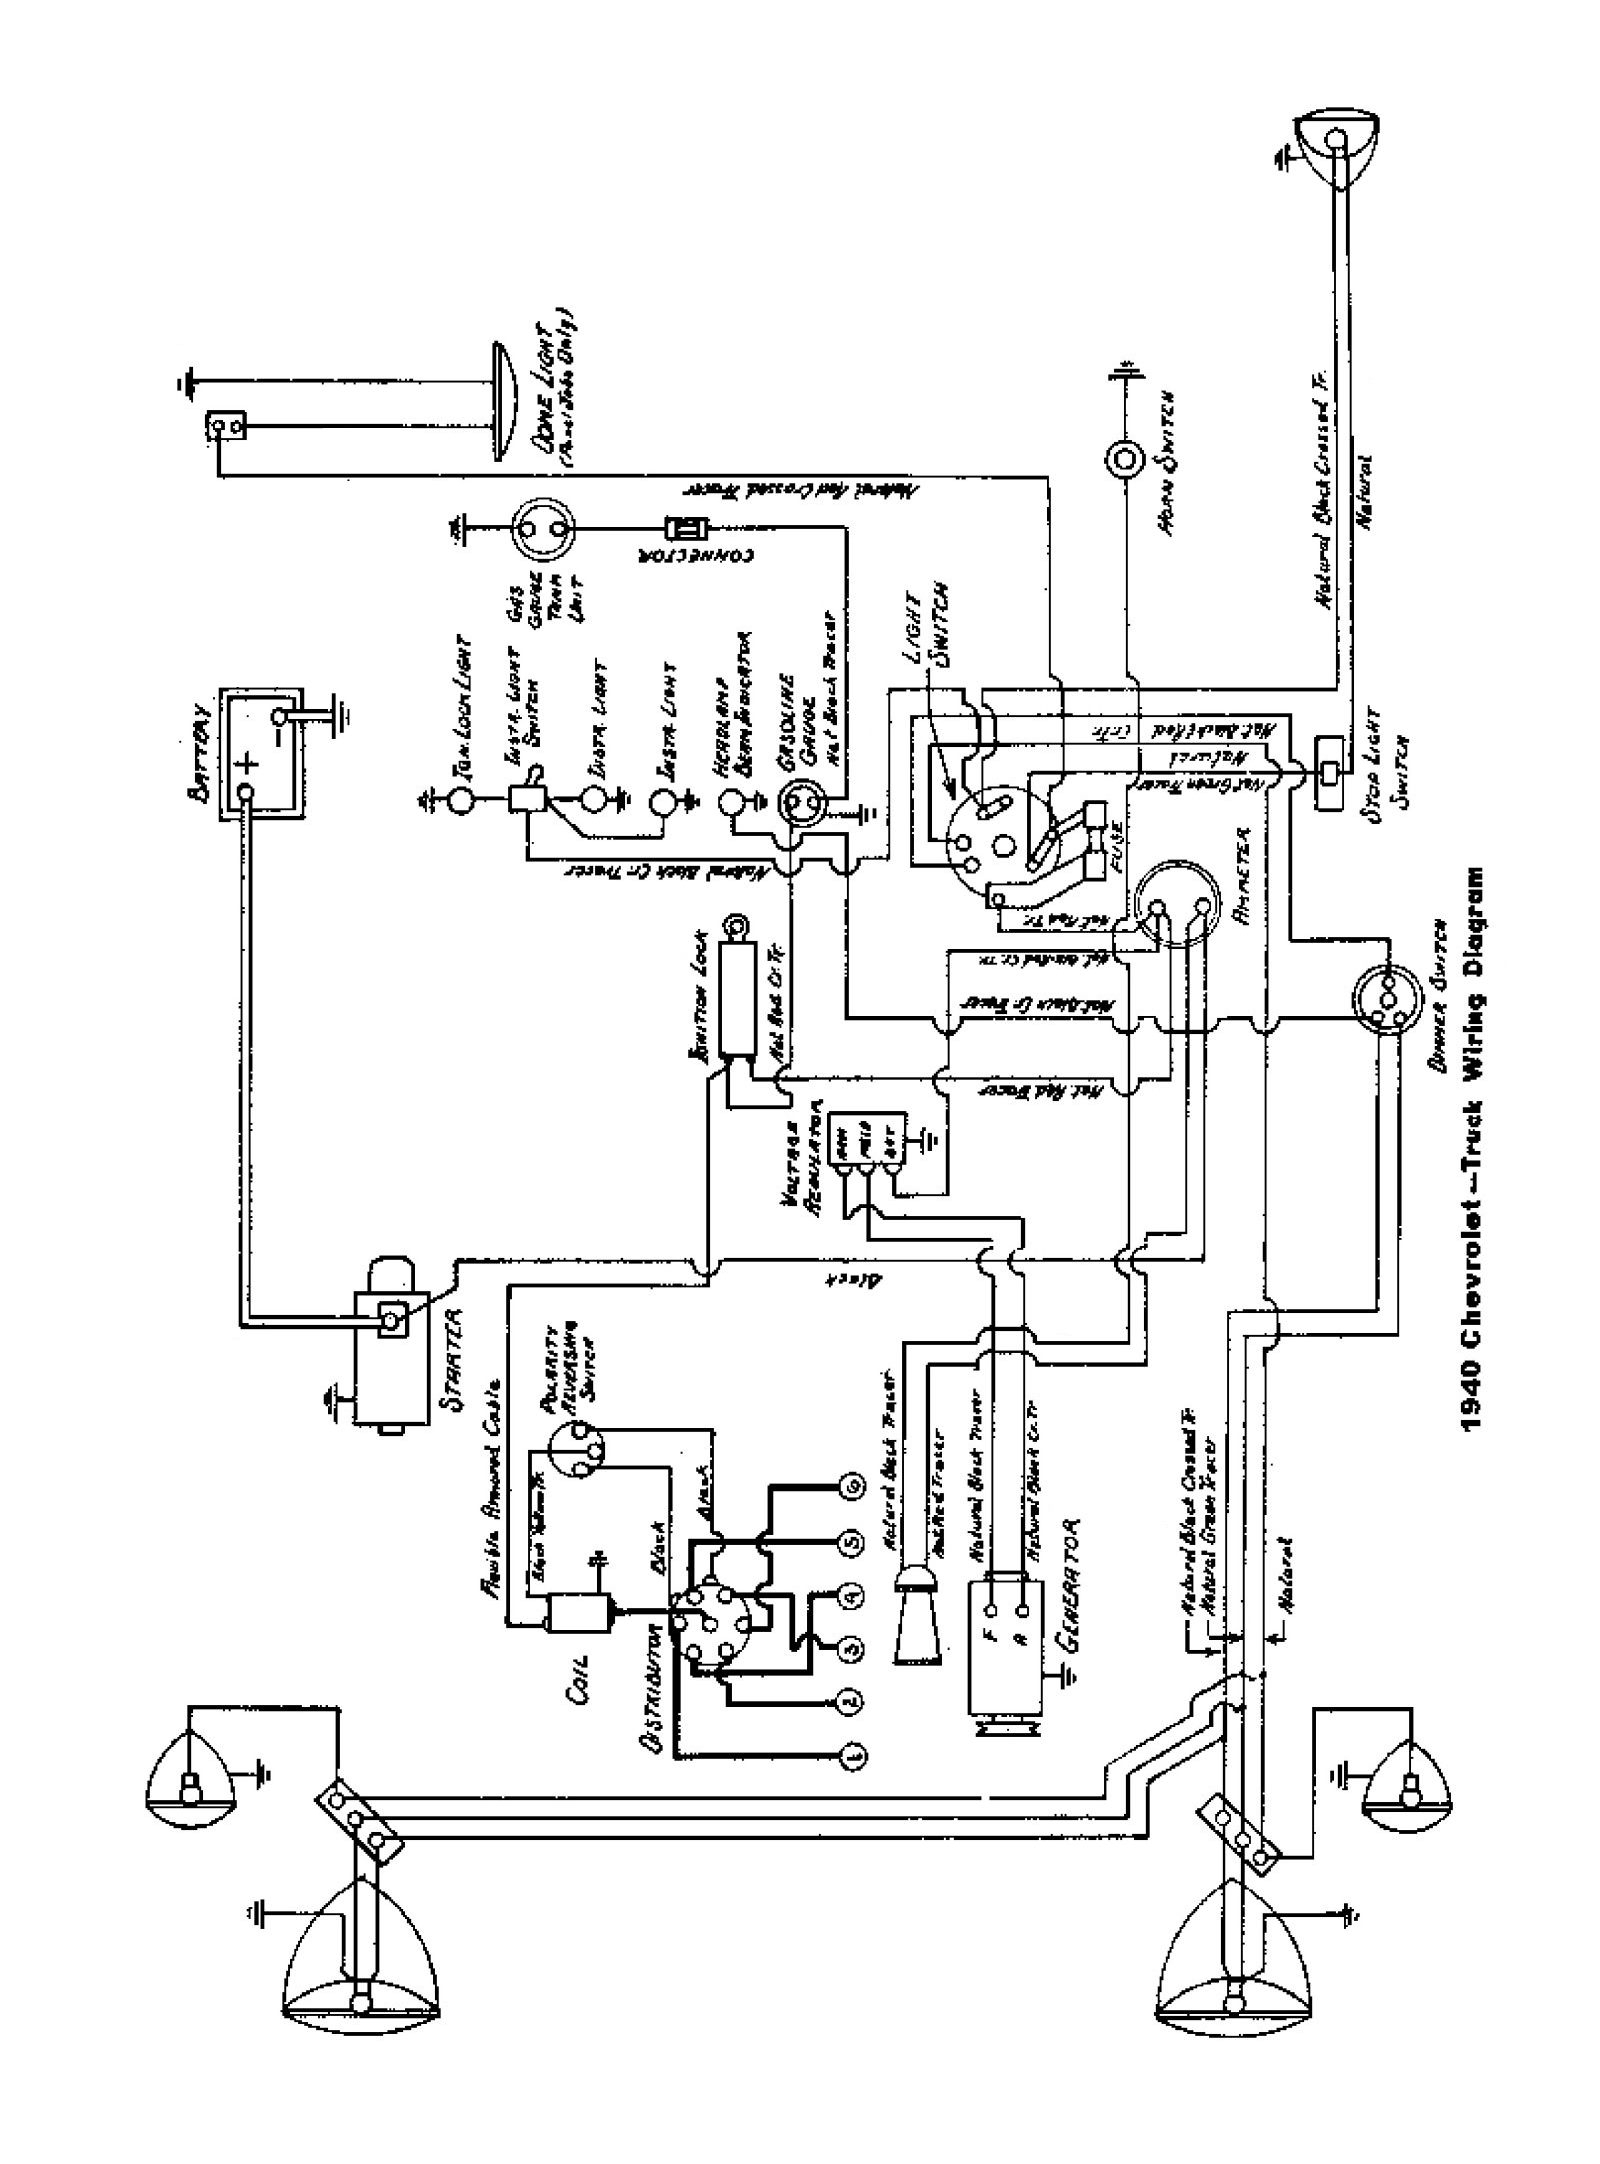 1951 Ford Wiper Diagram - Data Wiring Diagram Today - Windshield Wiper Motor Wiring Diagram